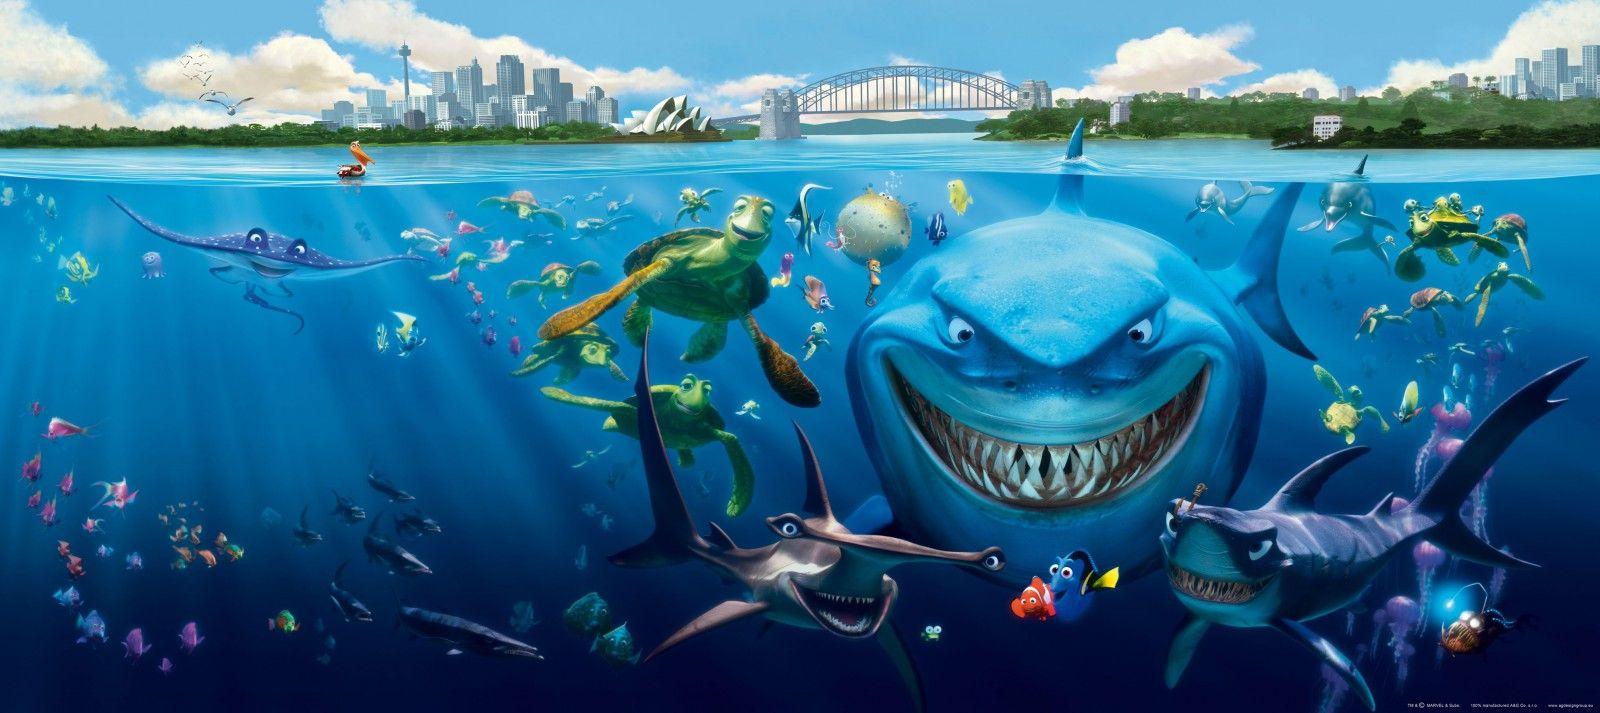 Wall mural wallpaper Finding Nemo 3 sharks Bruce Anchor & Chum photo 202 x 90 cm / 2.21 yd x 35 ...